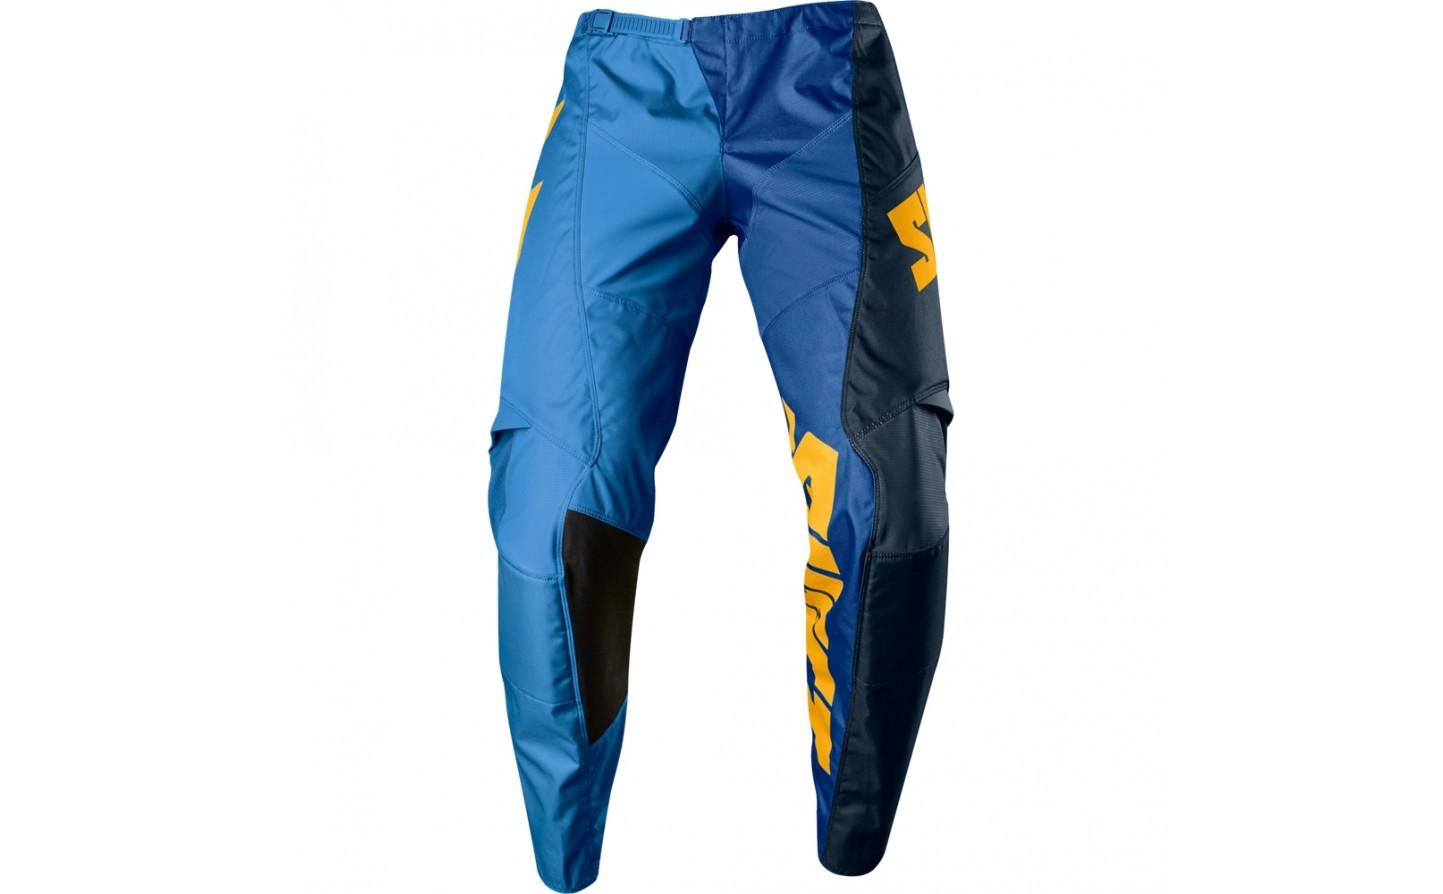 pantalon shift label whit3 tarmac azul talle 32